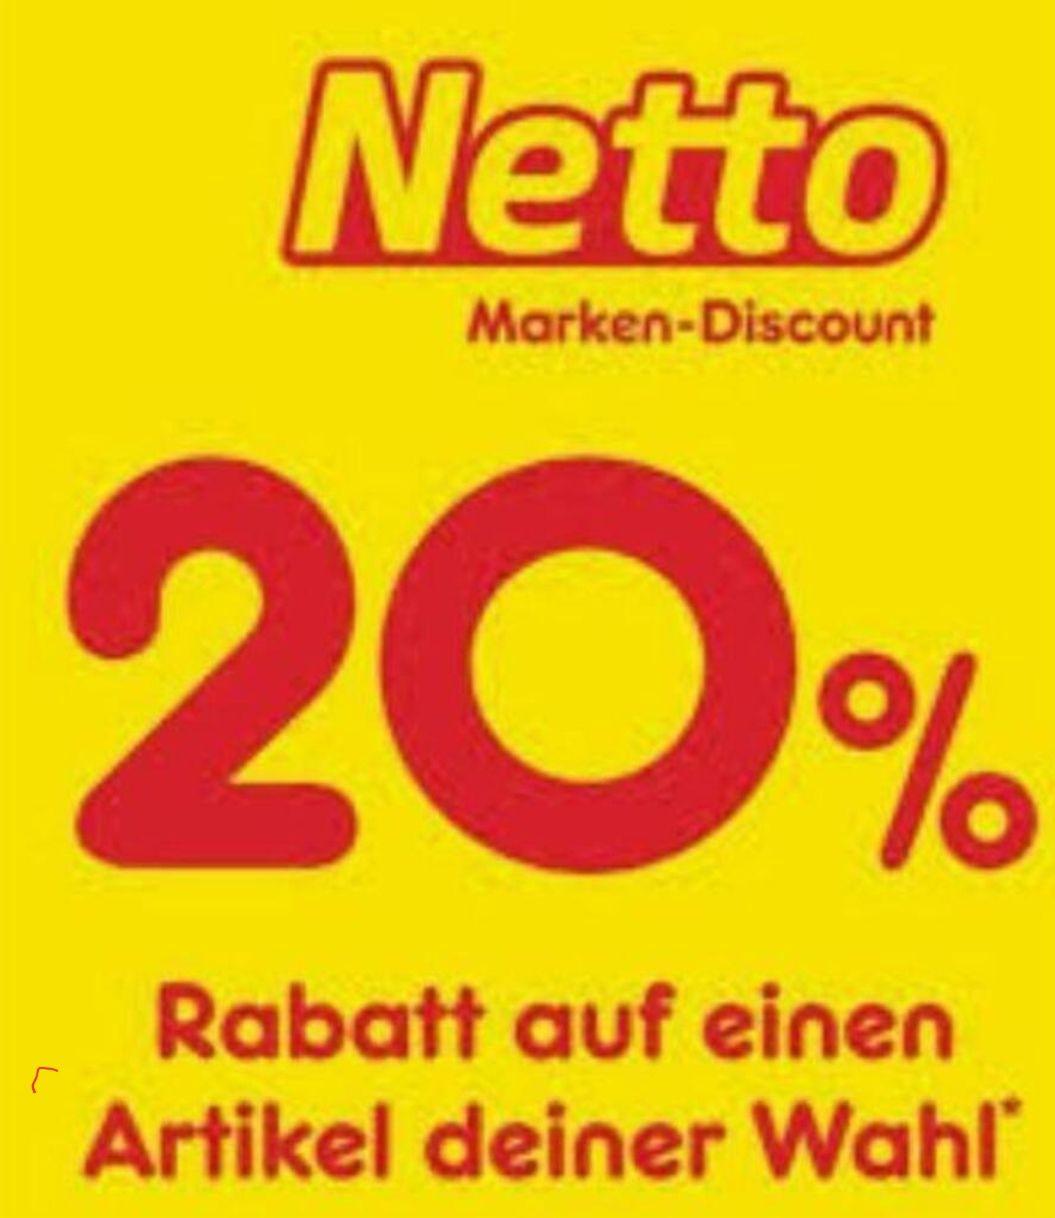 [Netto MD] Rabatt Coupons KW46 (09. - 14.11.), bundesweit einsetzbar